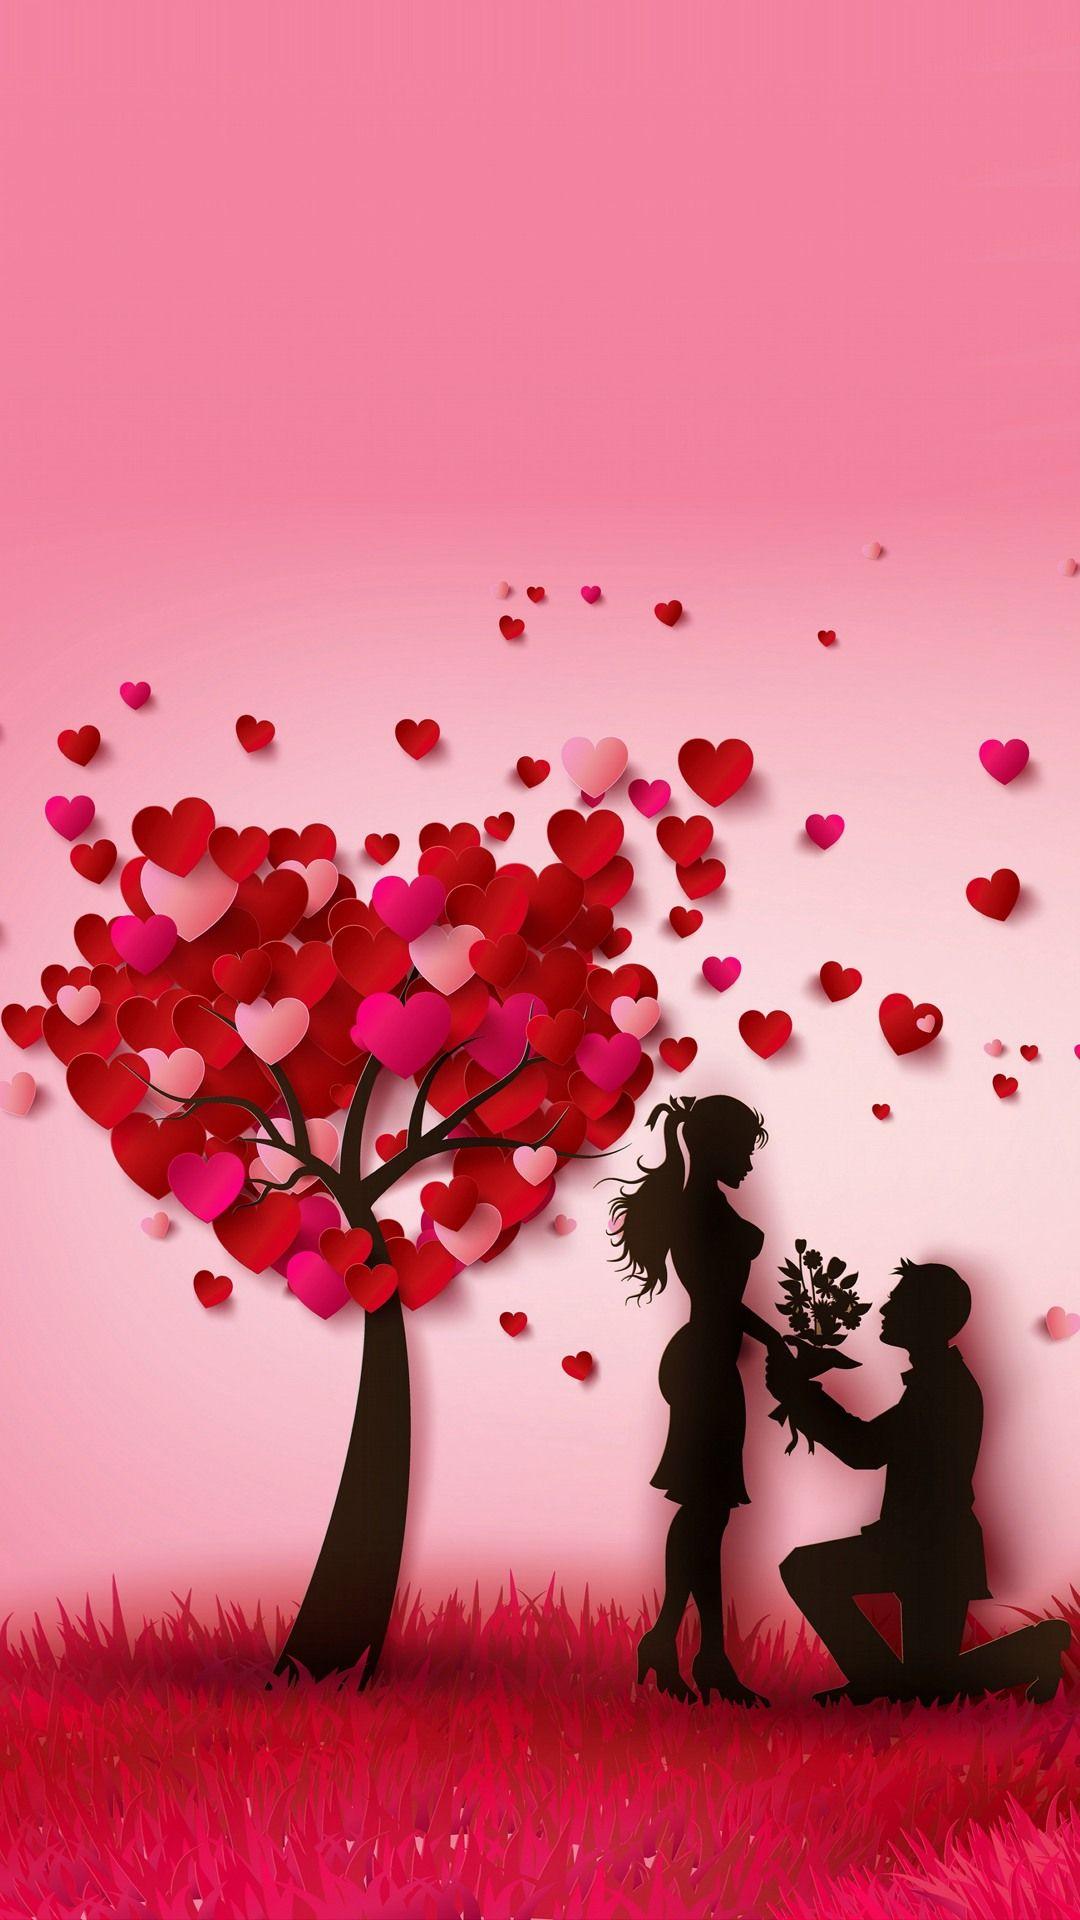 Pin By Lanka Vu On Oboi Na Telefon Cute Love Wallpapers Love Couple Wallpaper Love Wallpaper Backgrounds